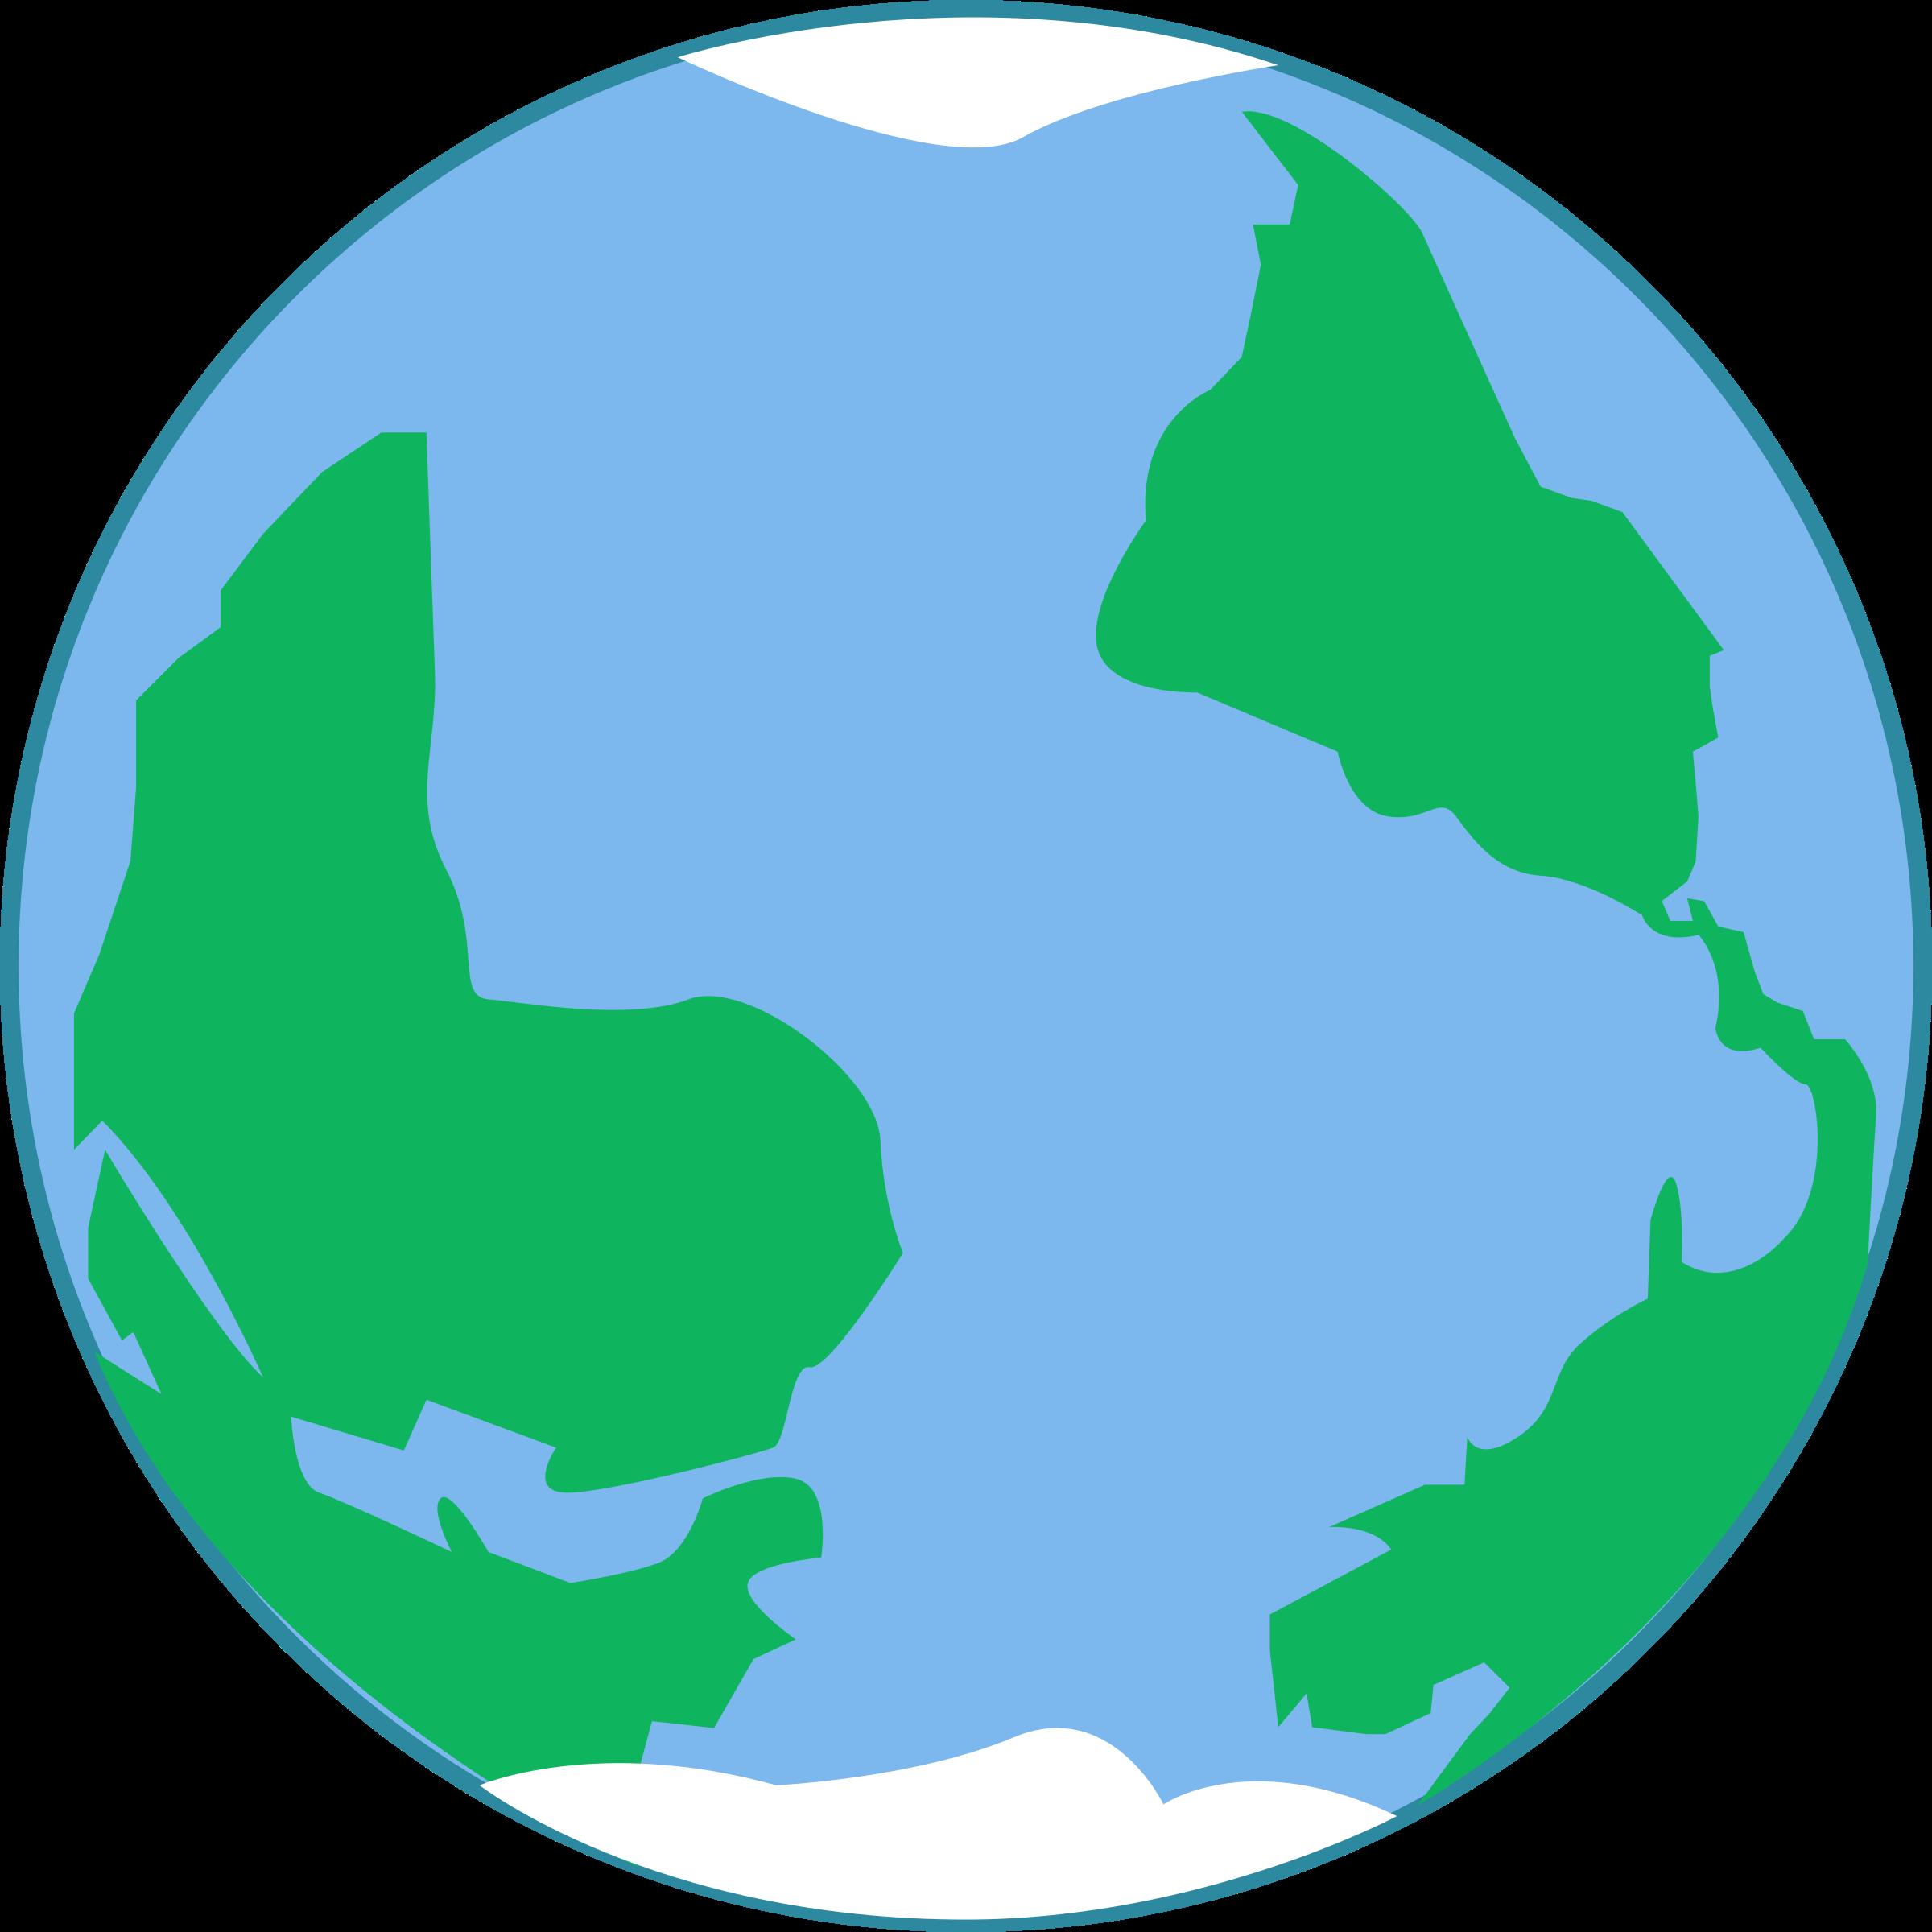 Earth,Globe,World,Clip art,Graphics #4488489.